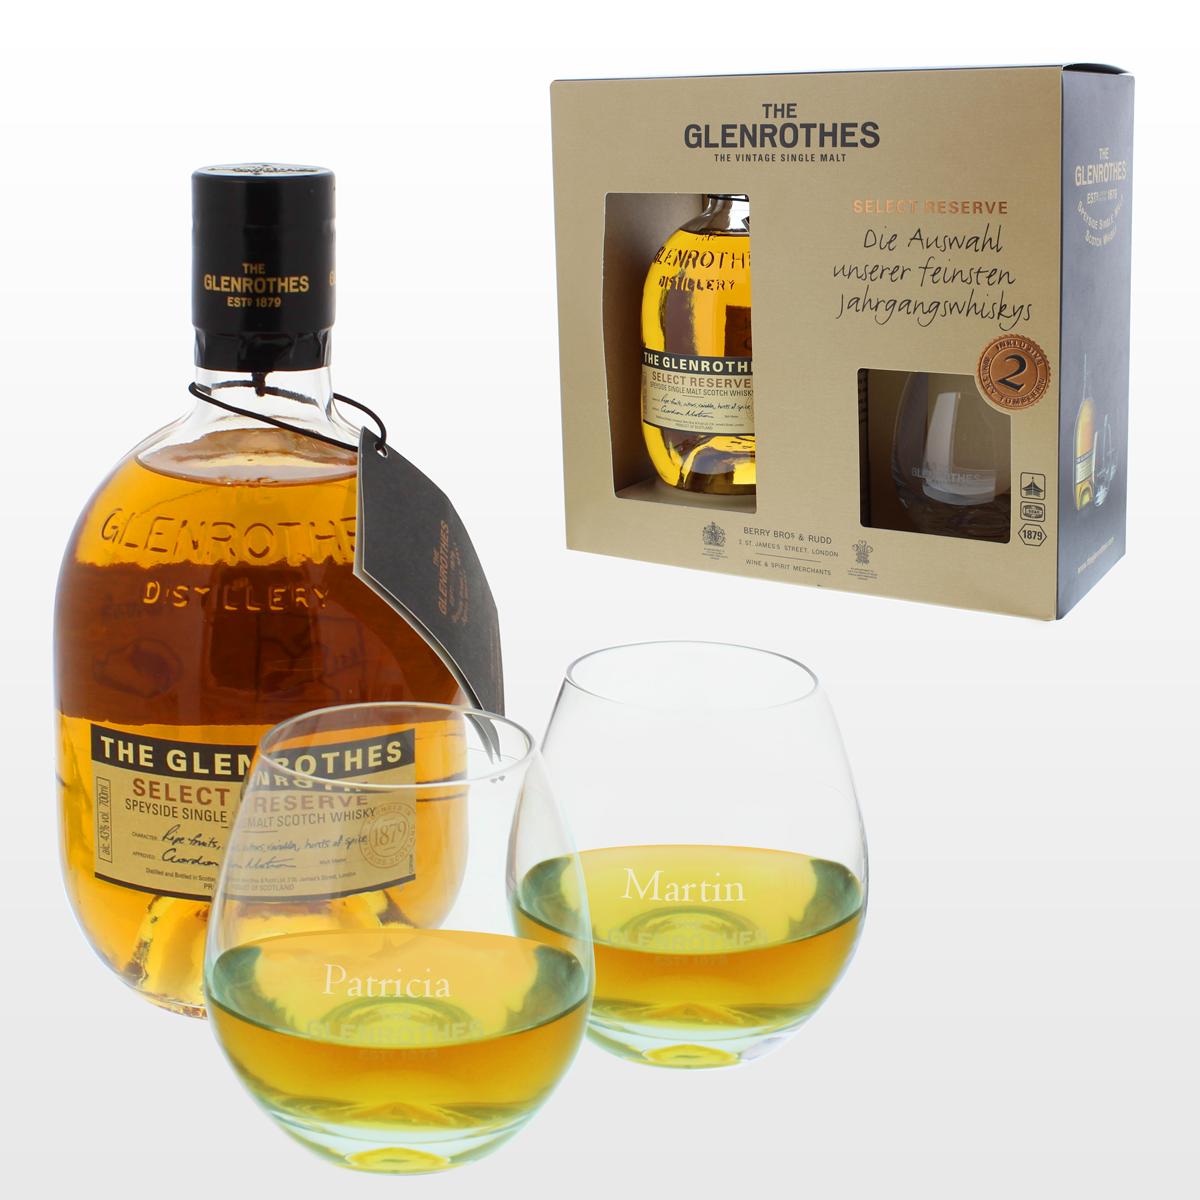 Whisky Glenrothes, Whisky, single malt, cadeau, anniversaire, Glenrothes, verres gravés